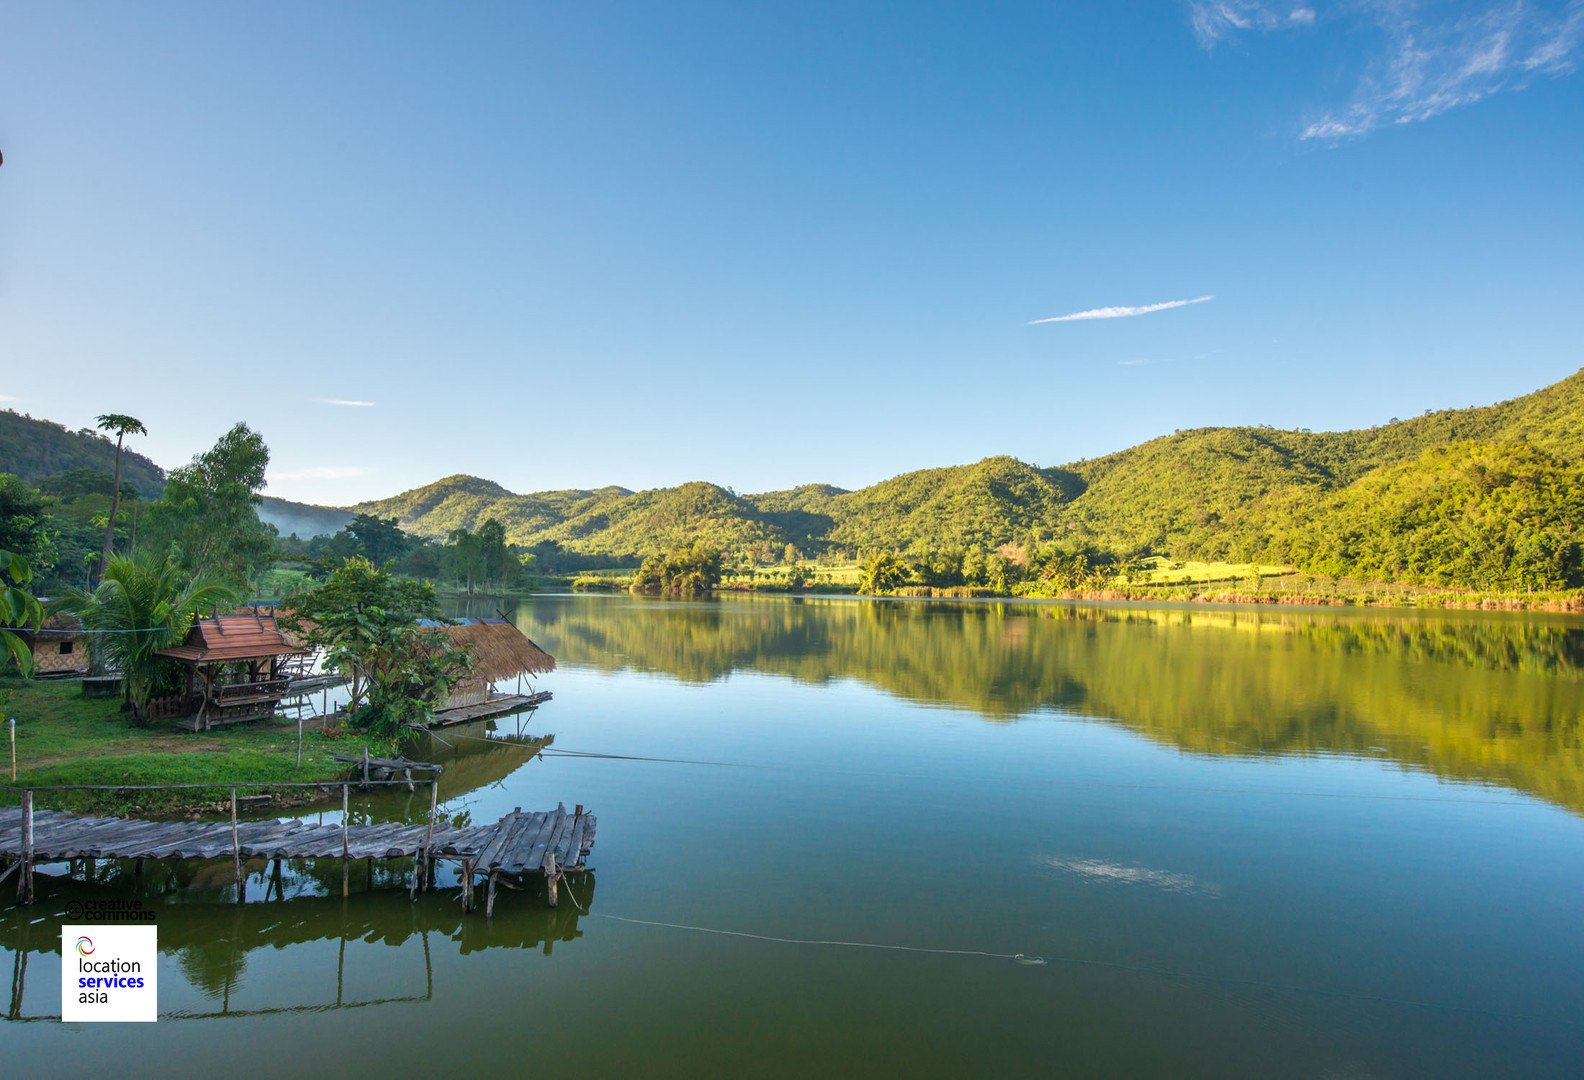 thai locations dams lakes x.jpg